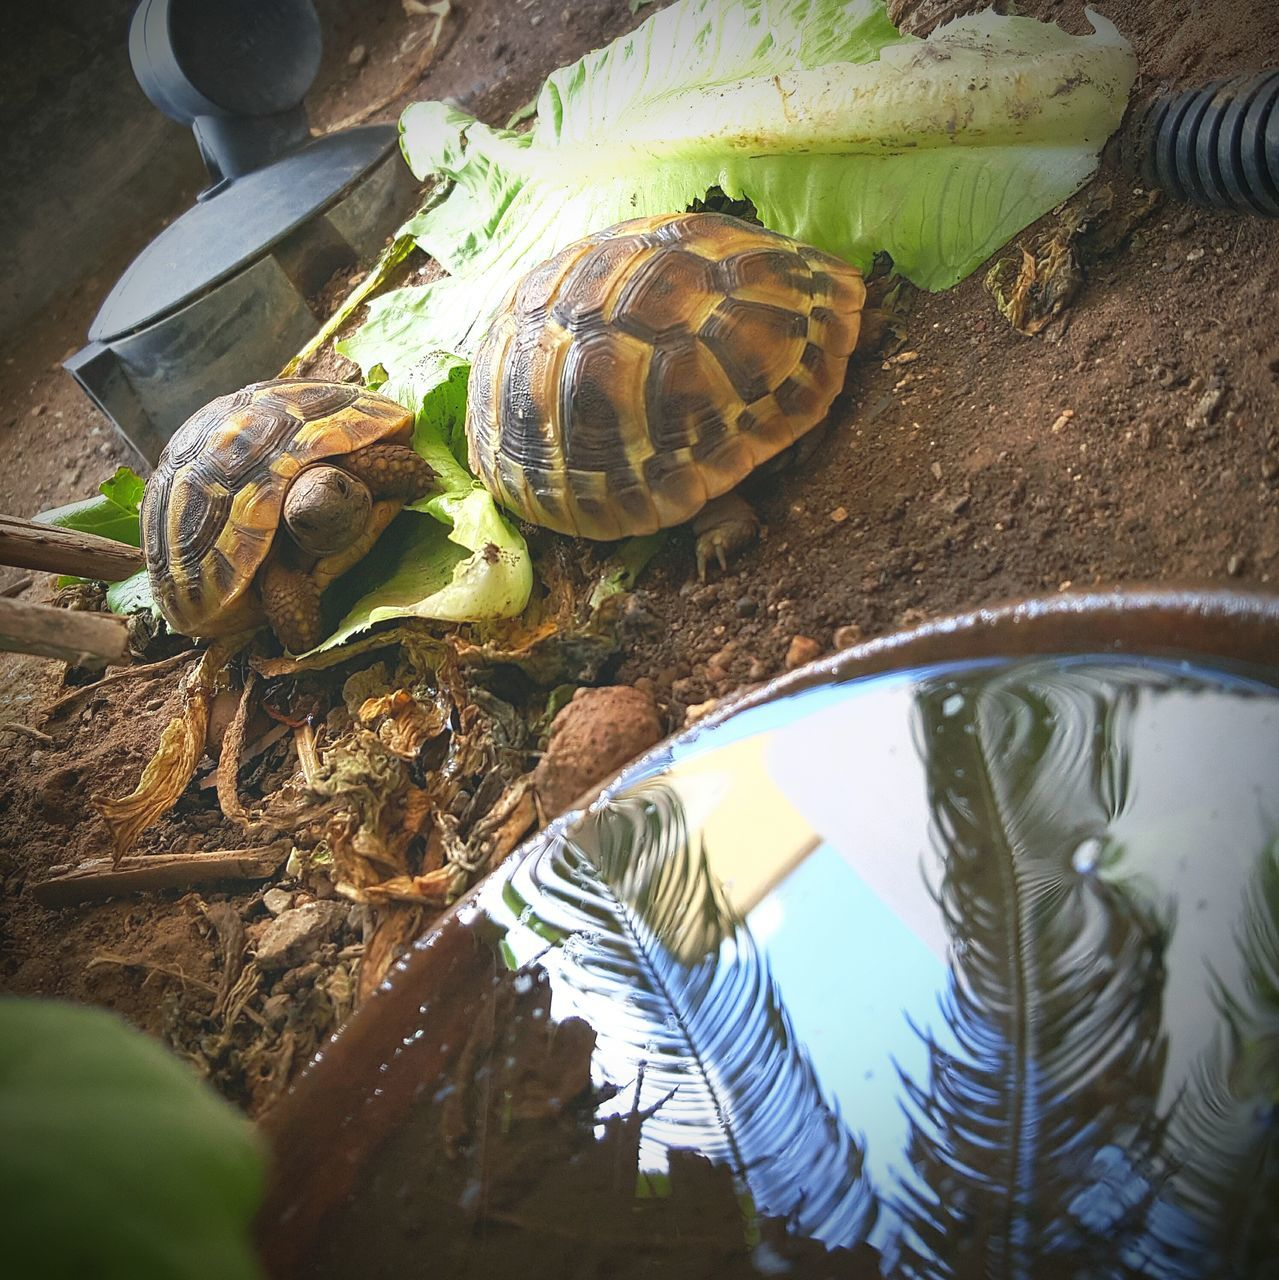 Turtles On Ground